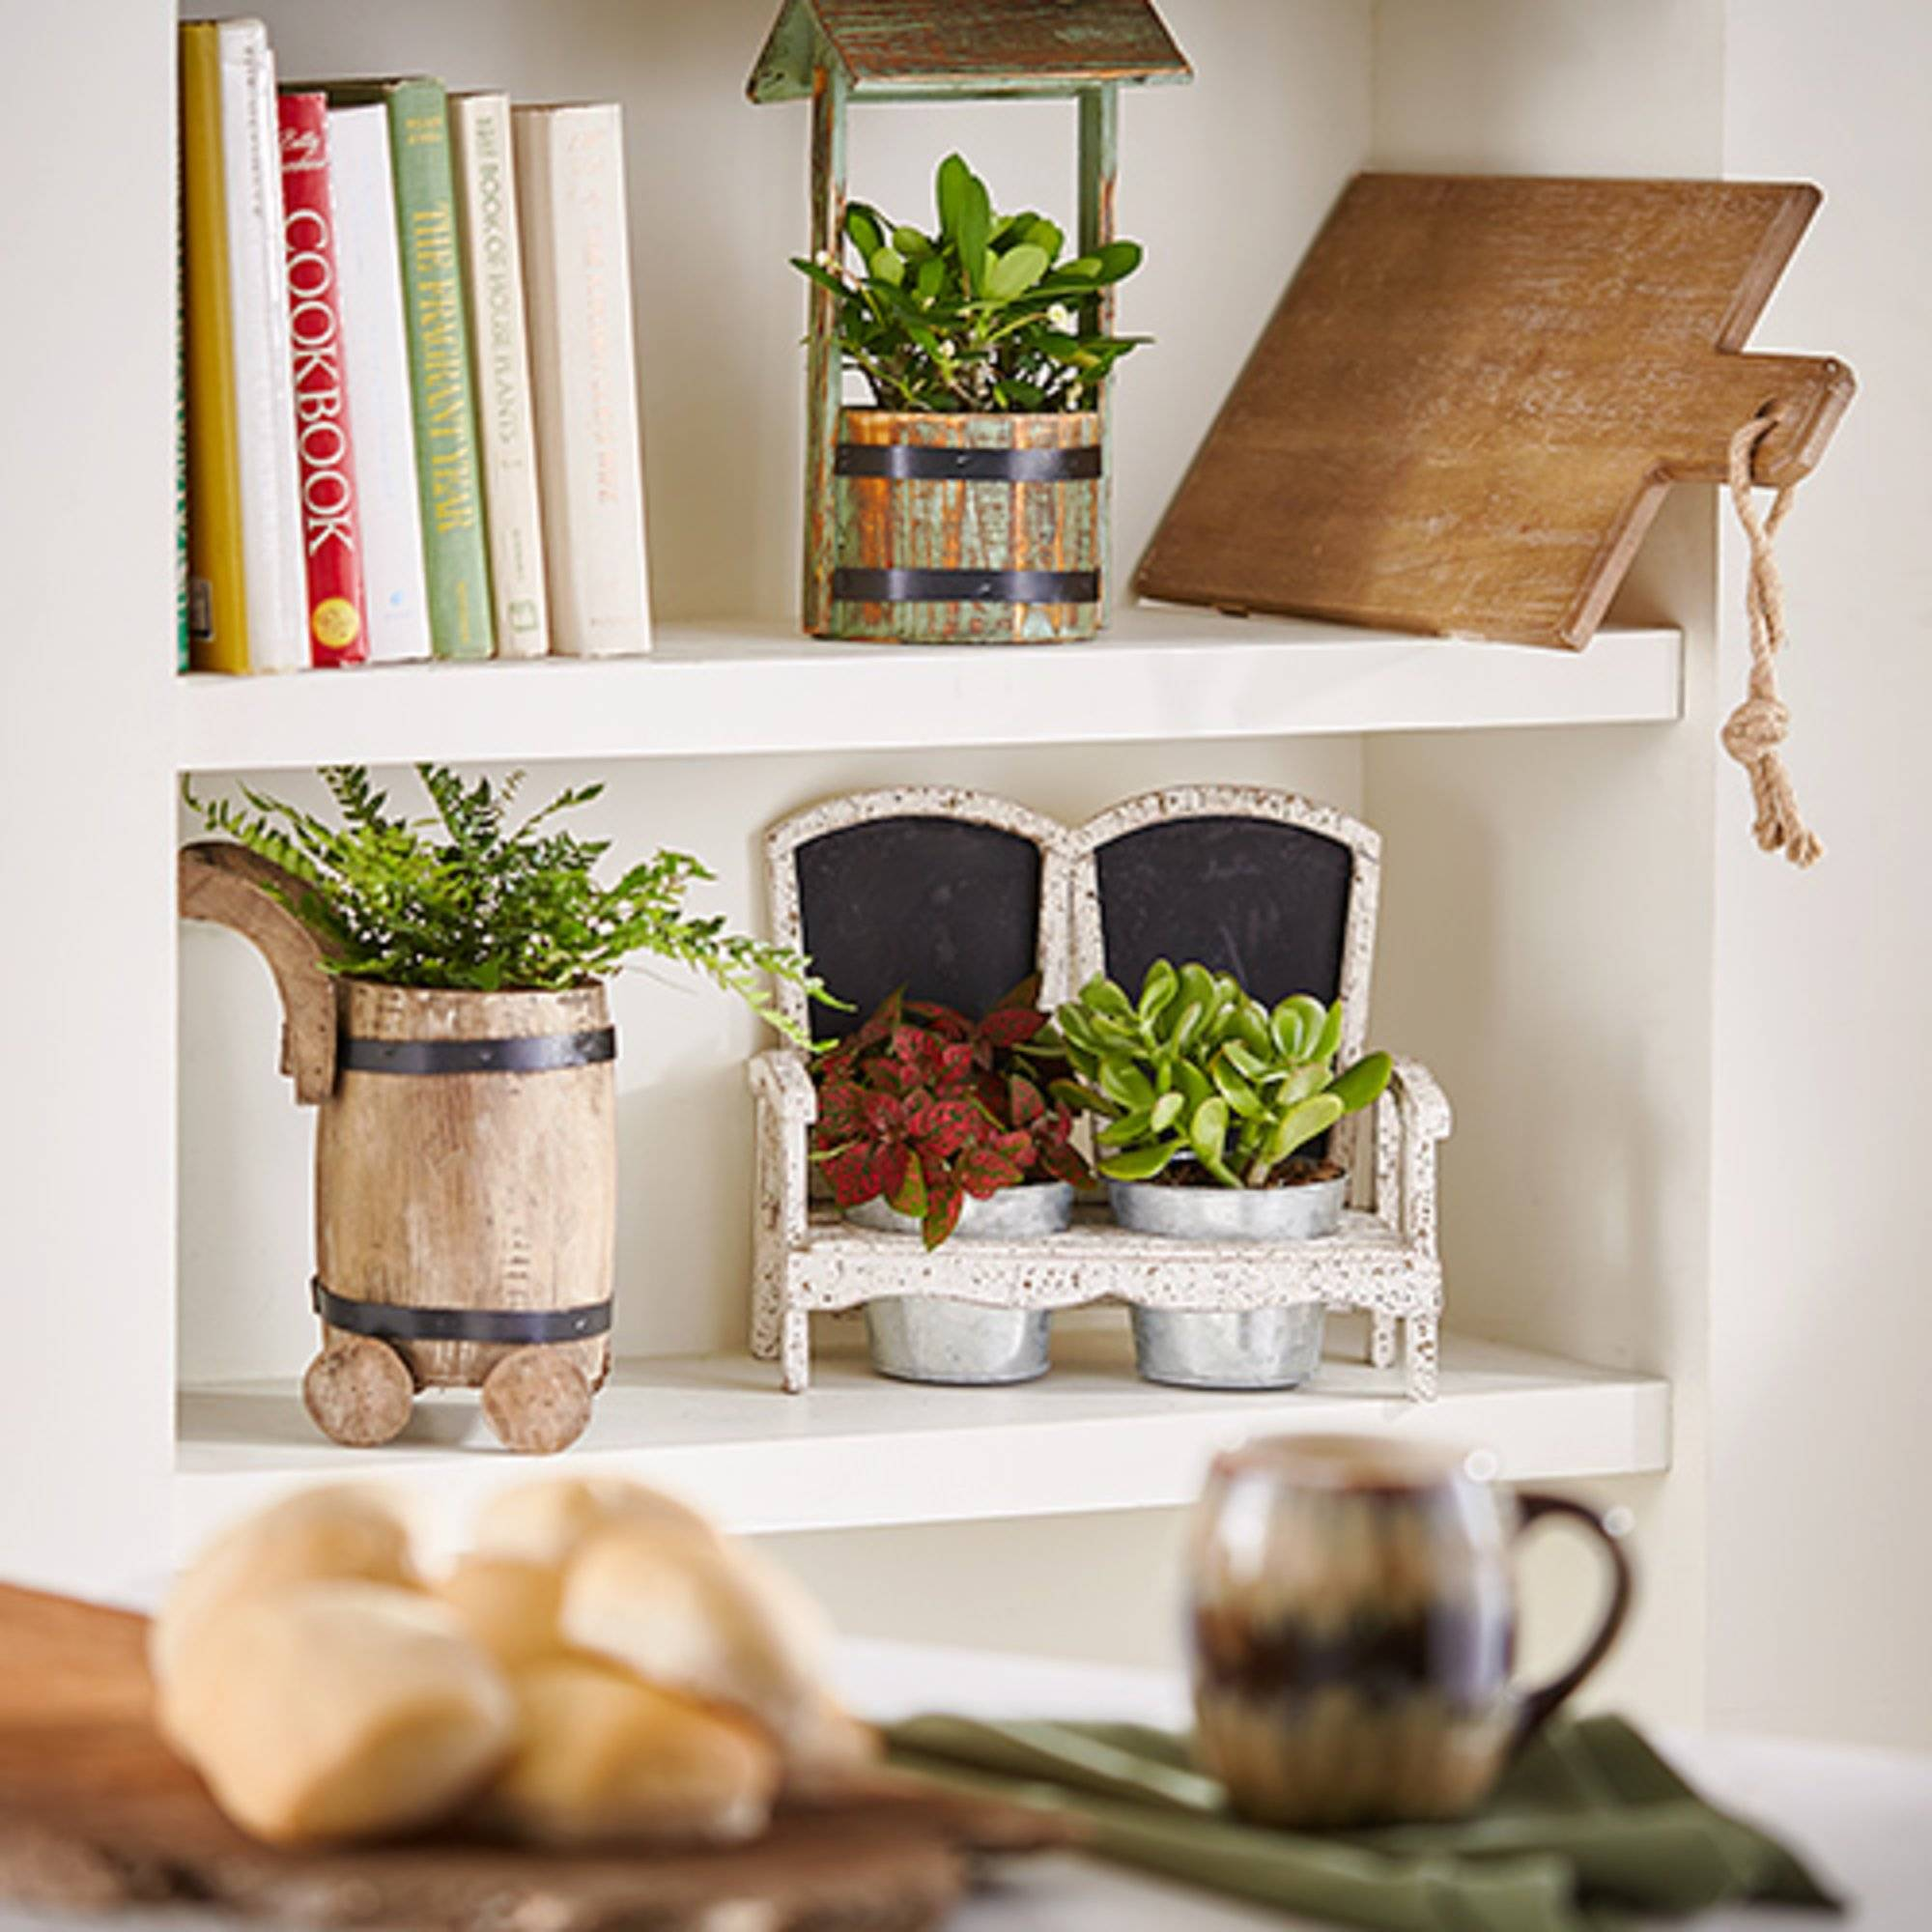 Home Decor Imports: Wholesale Home Decor, Furnishing